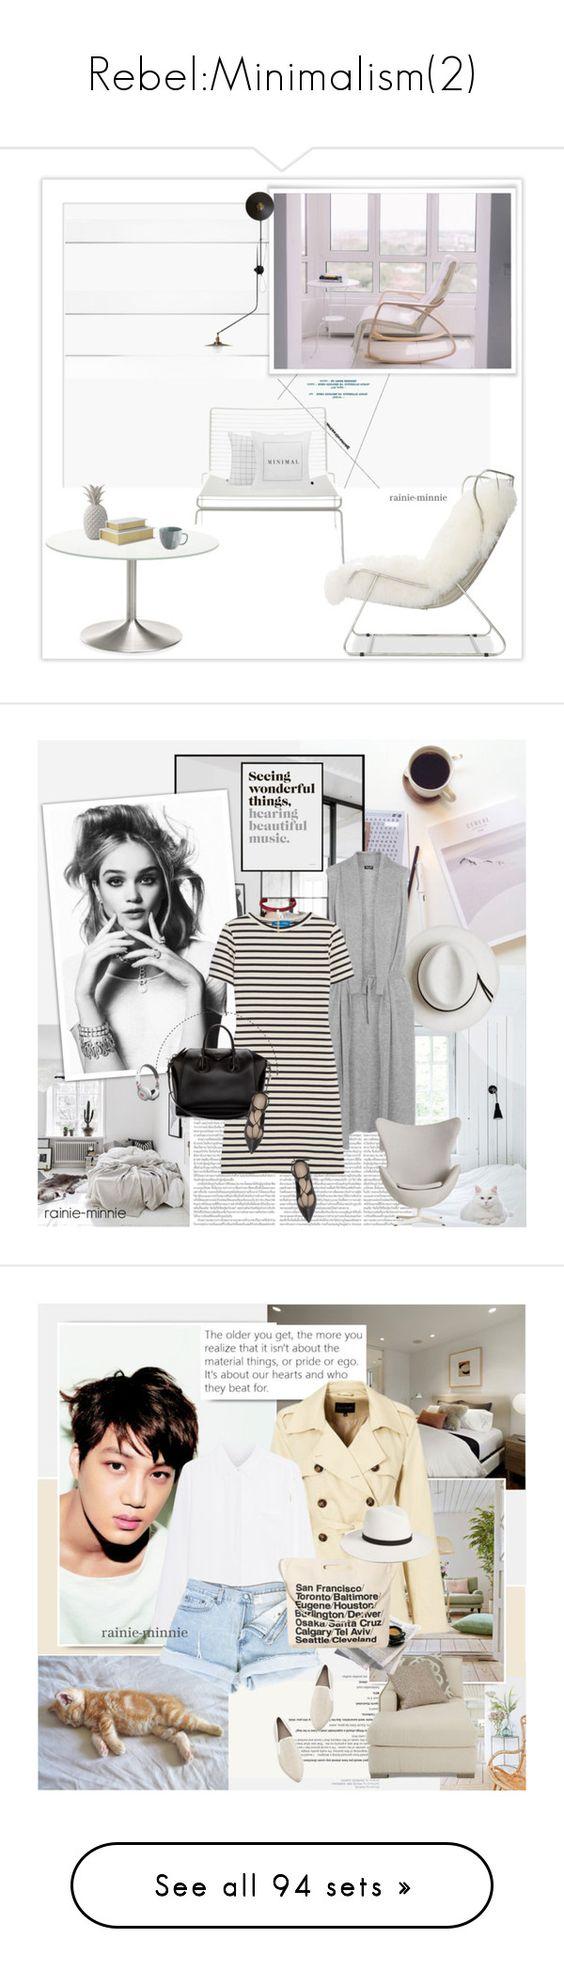 """Rebel:Minimalism(2)"" by rainie-minnie ❤ liked on Polyvore featuring minimalism, personalstyle, rainieminnie, interior, interiors, interior design, home, home decor, interior decorating and HAY"